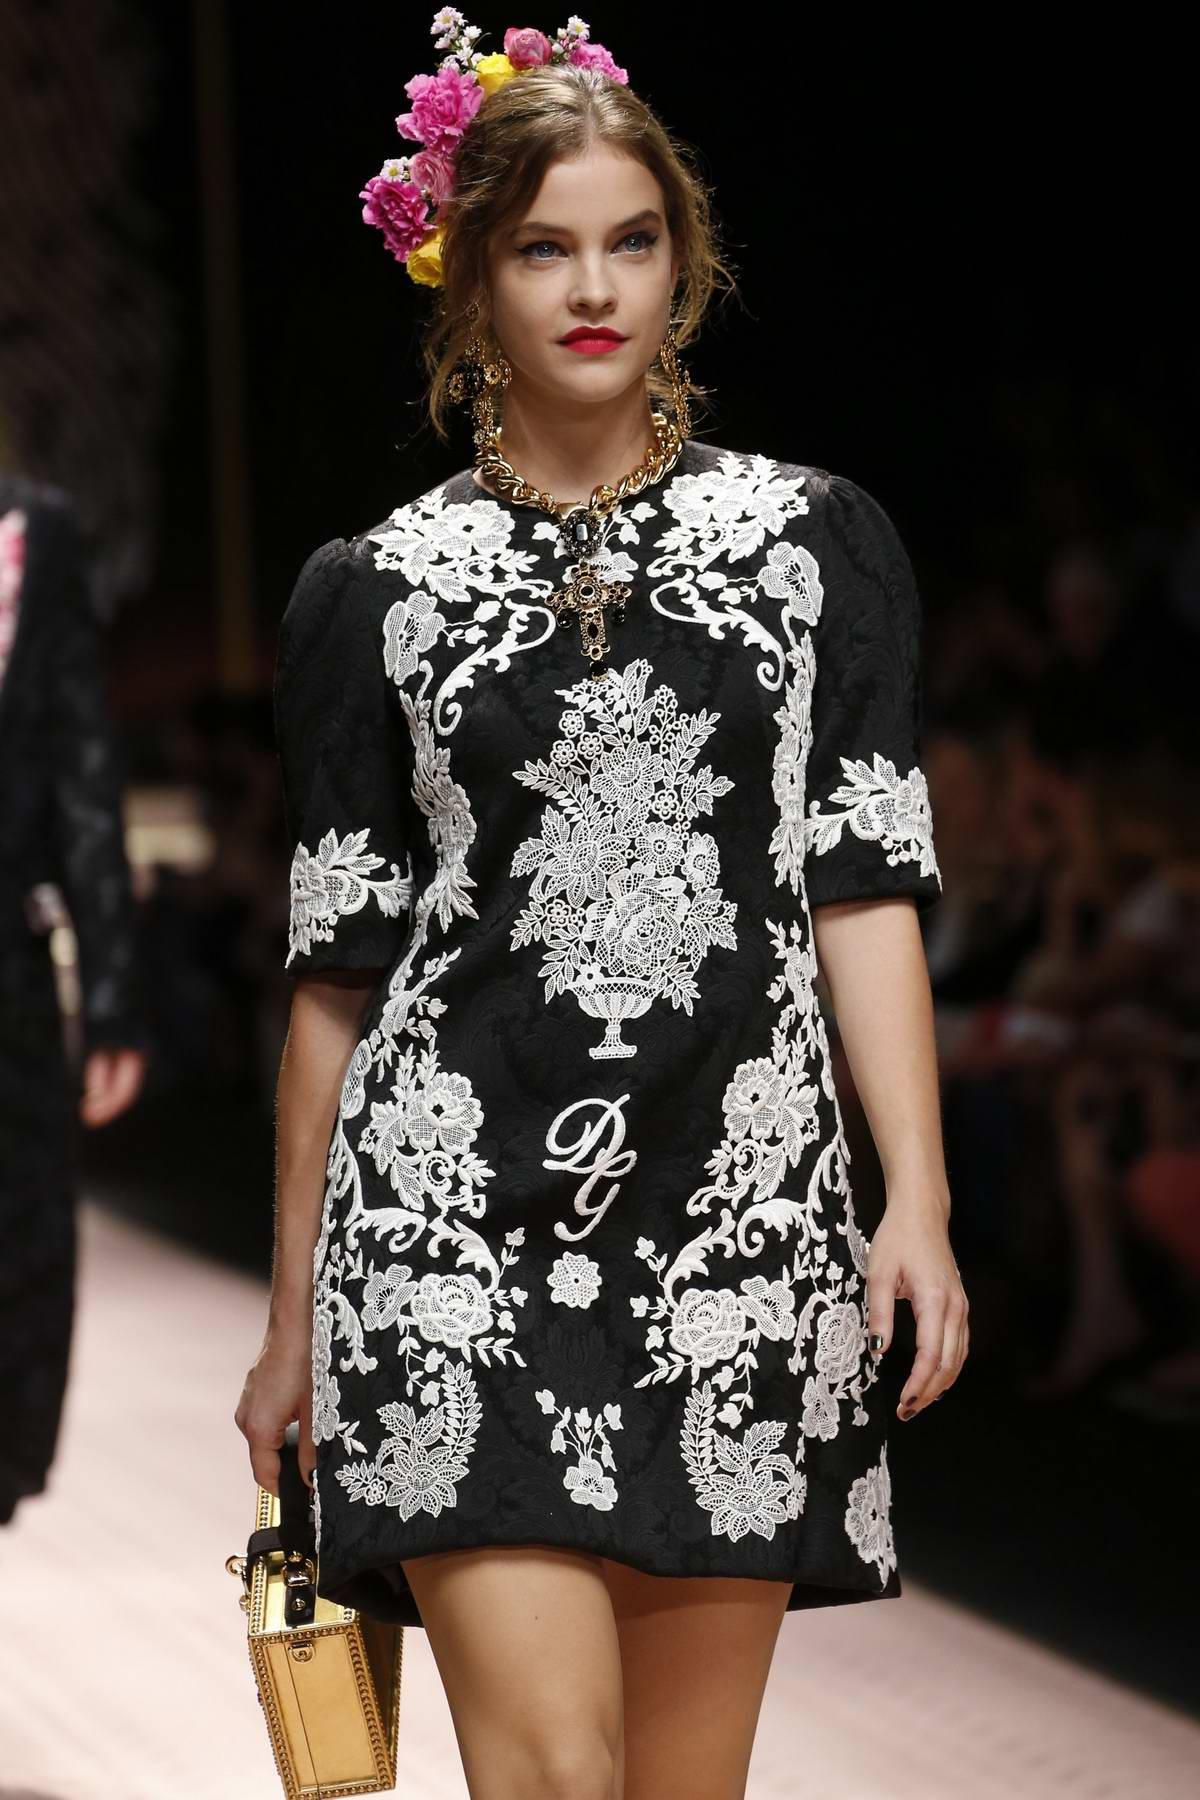 94cab9ef barbara palvin walks the runway for dolce & gabbana fashion show,  spring-summer 2019 during milan fashion week in milan, italy-230918_5